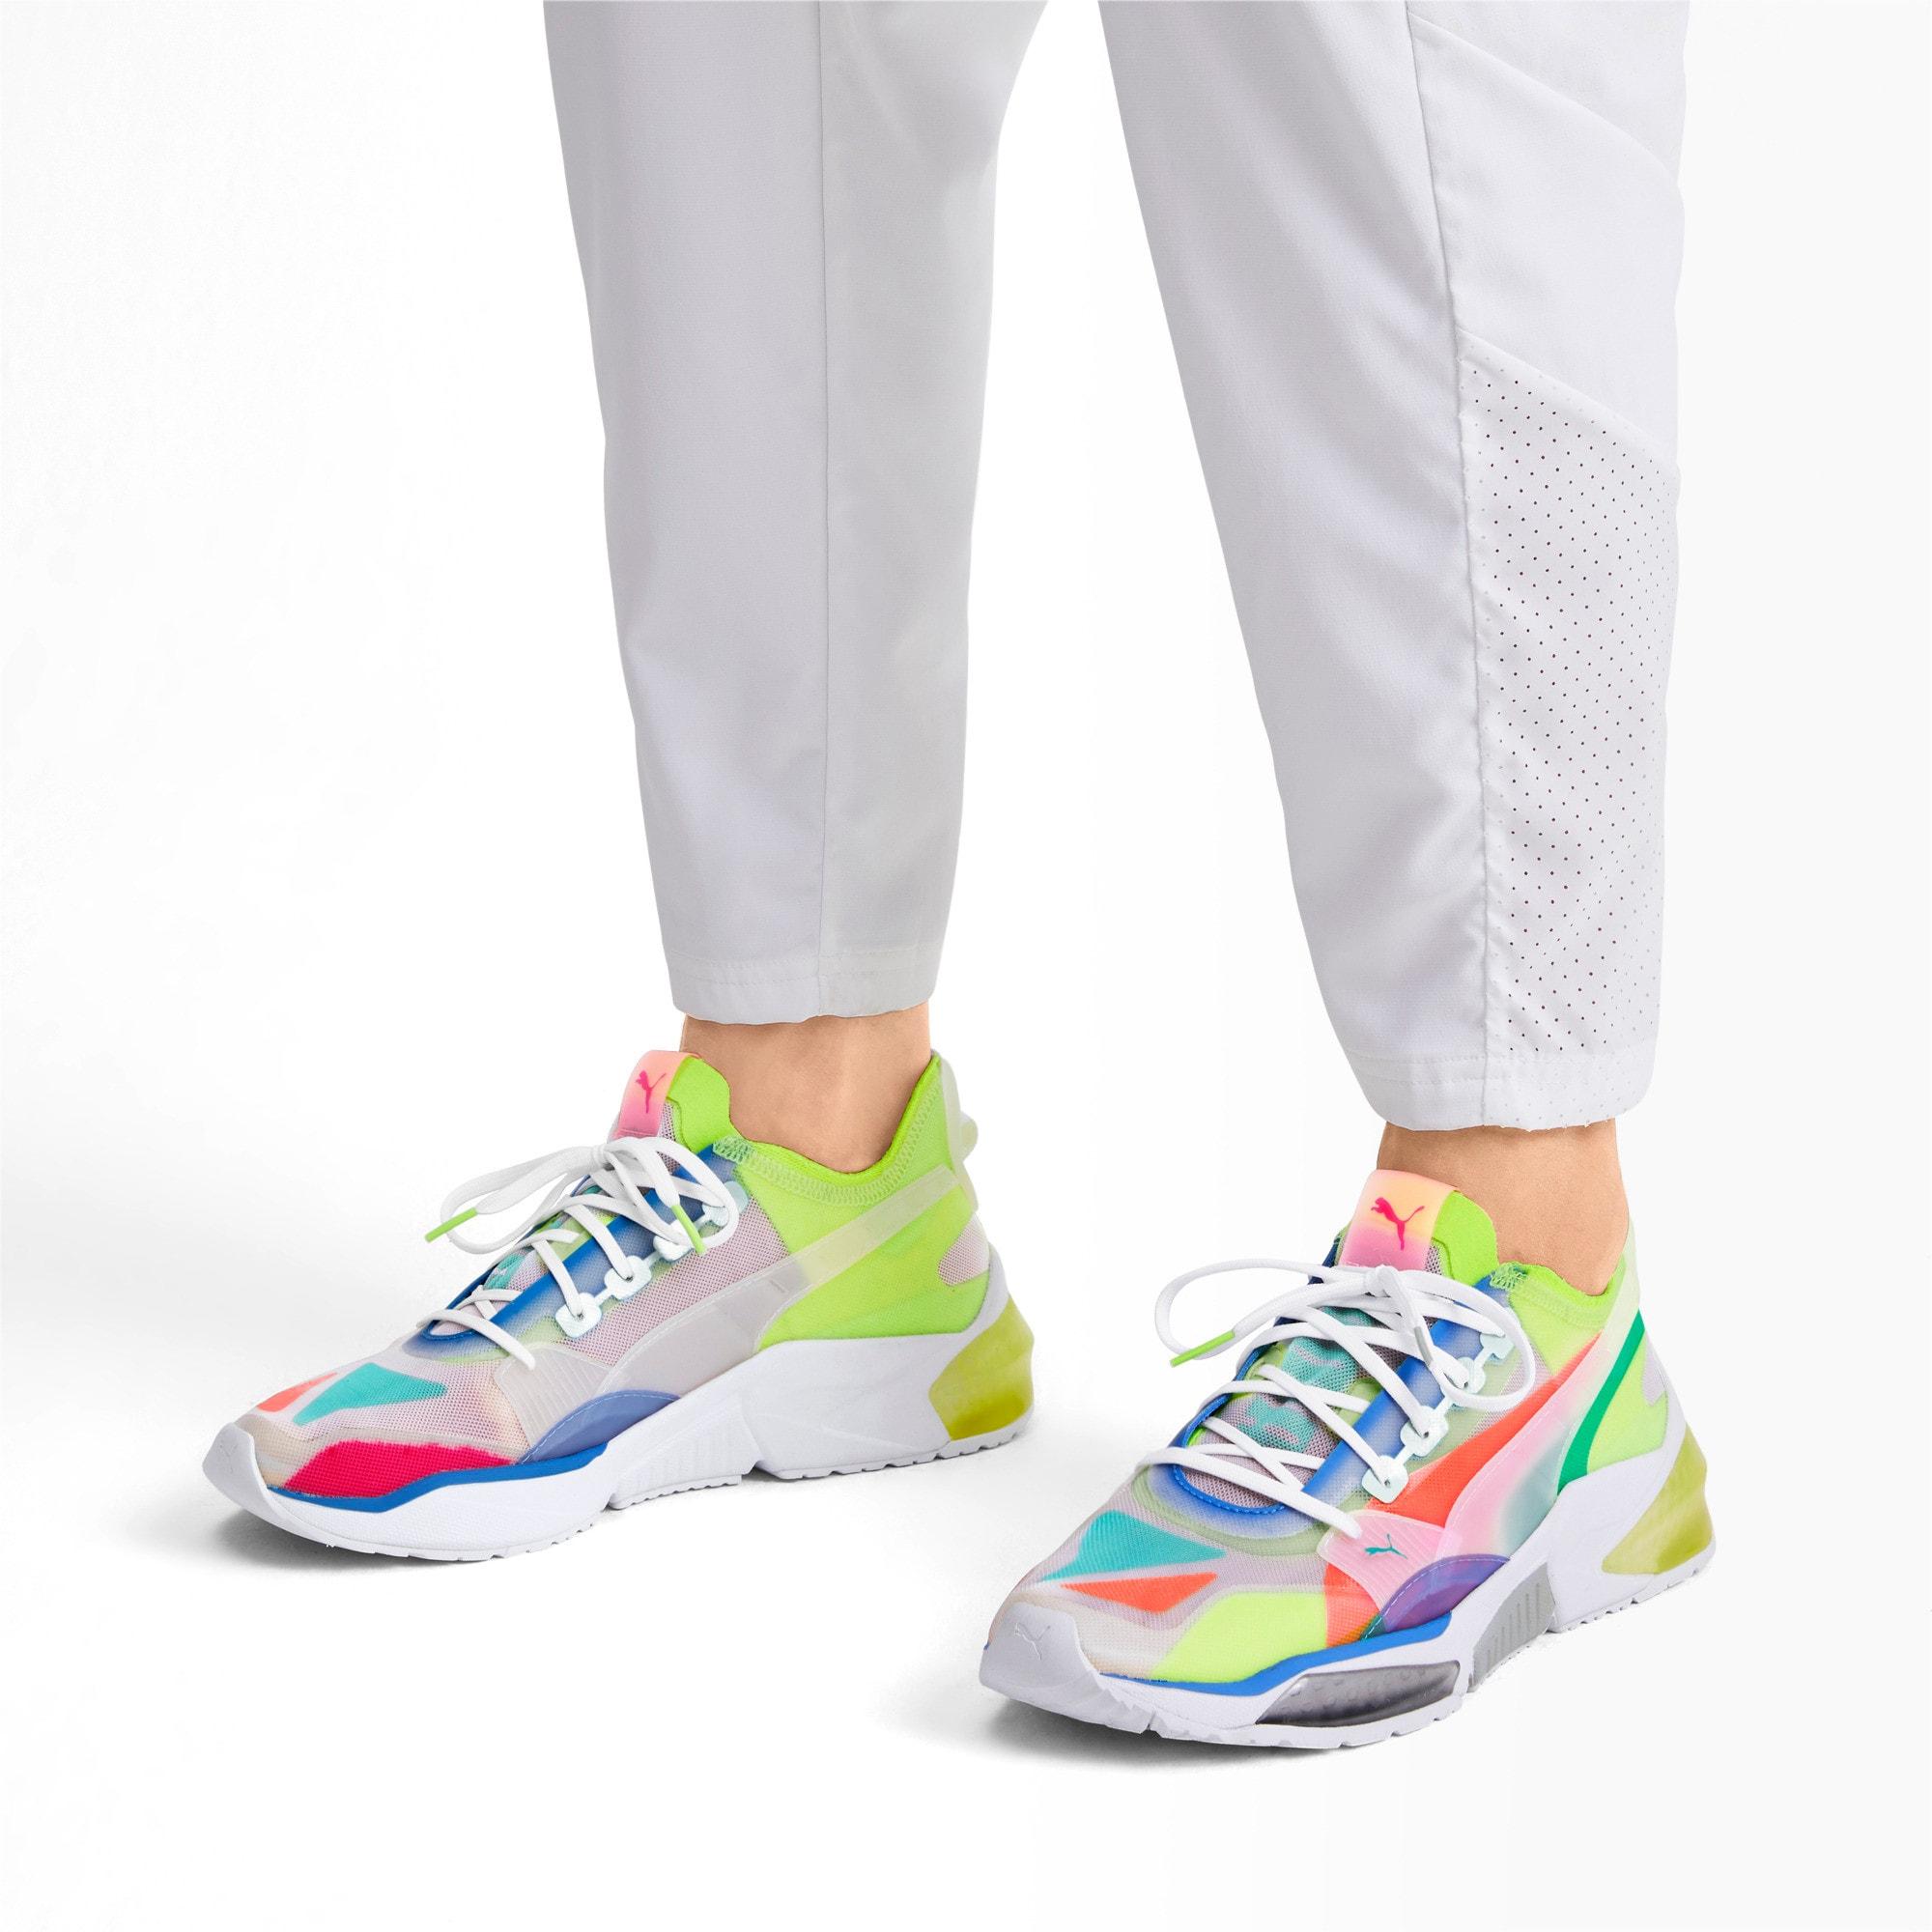 Thumbnail 2 of LQDCELL Optic Sheer Men's Training Shoes, Puma White, medium